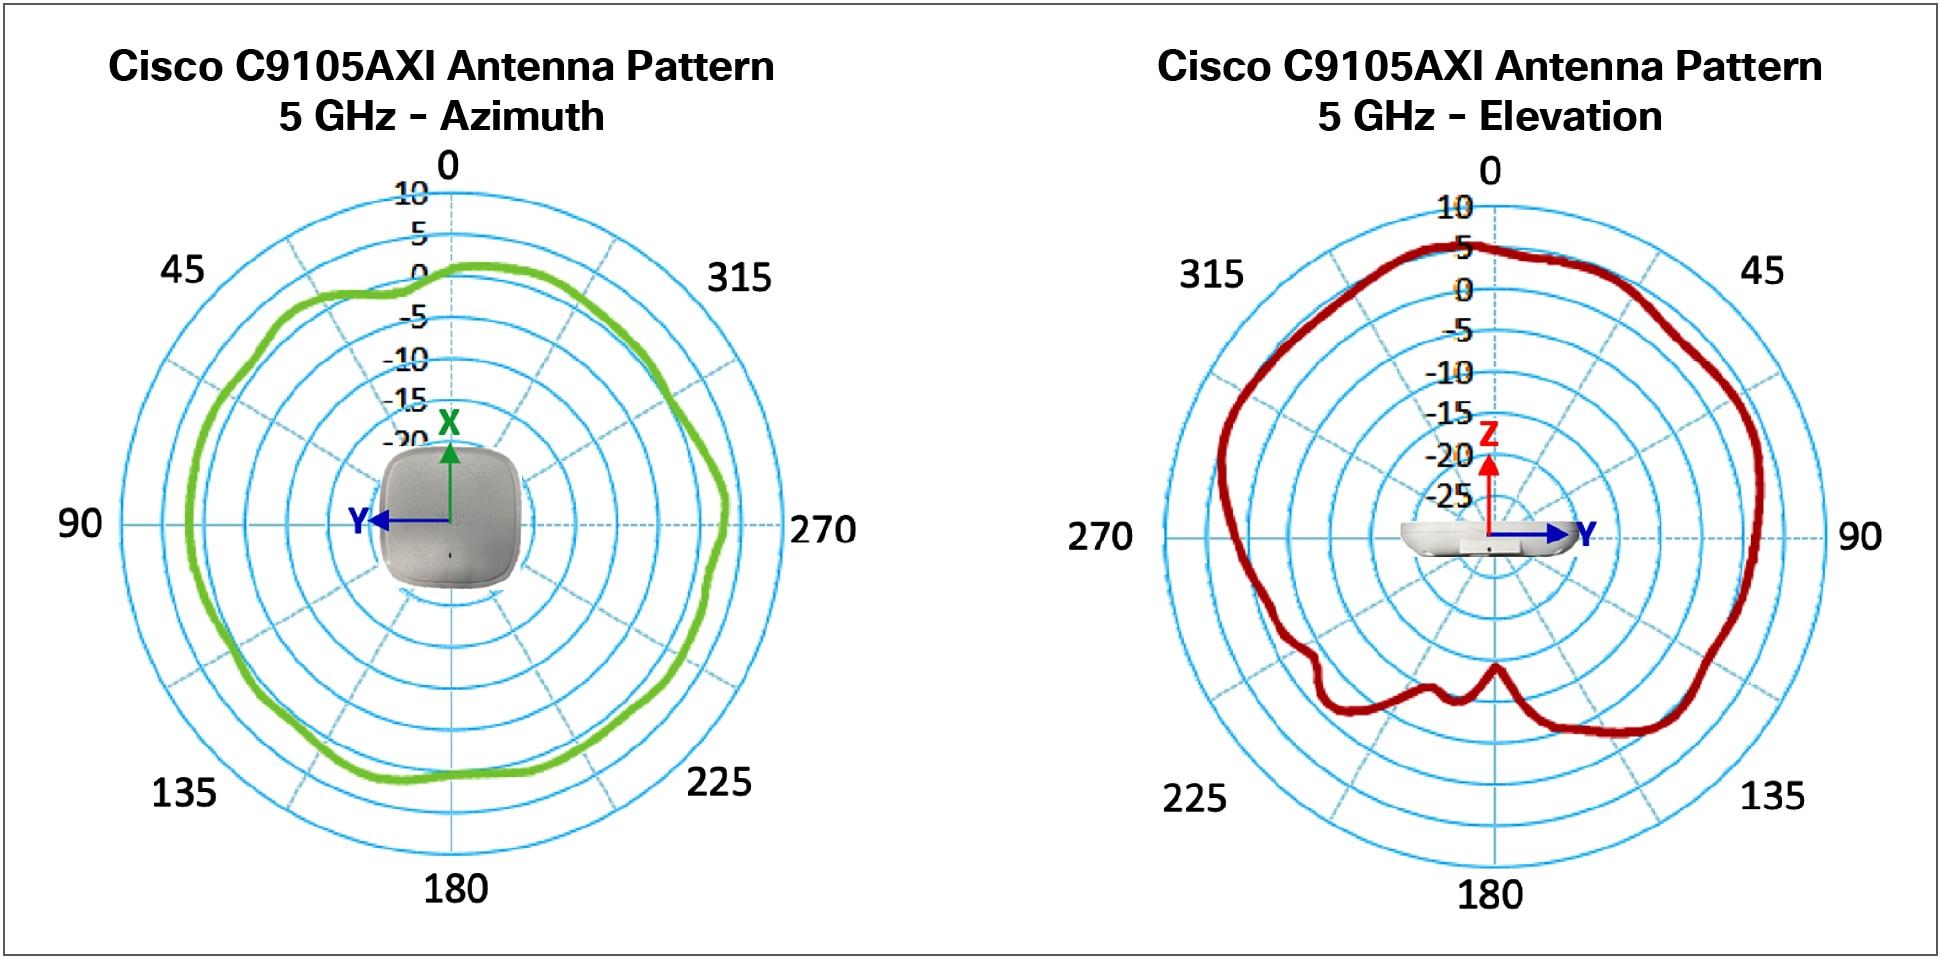 Cisco C9105AXI Antenna Pattern_5 GHz (Azimuth & Elevation)